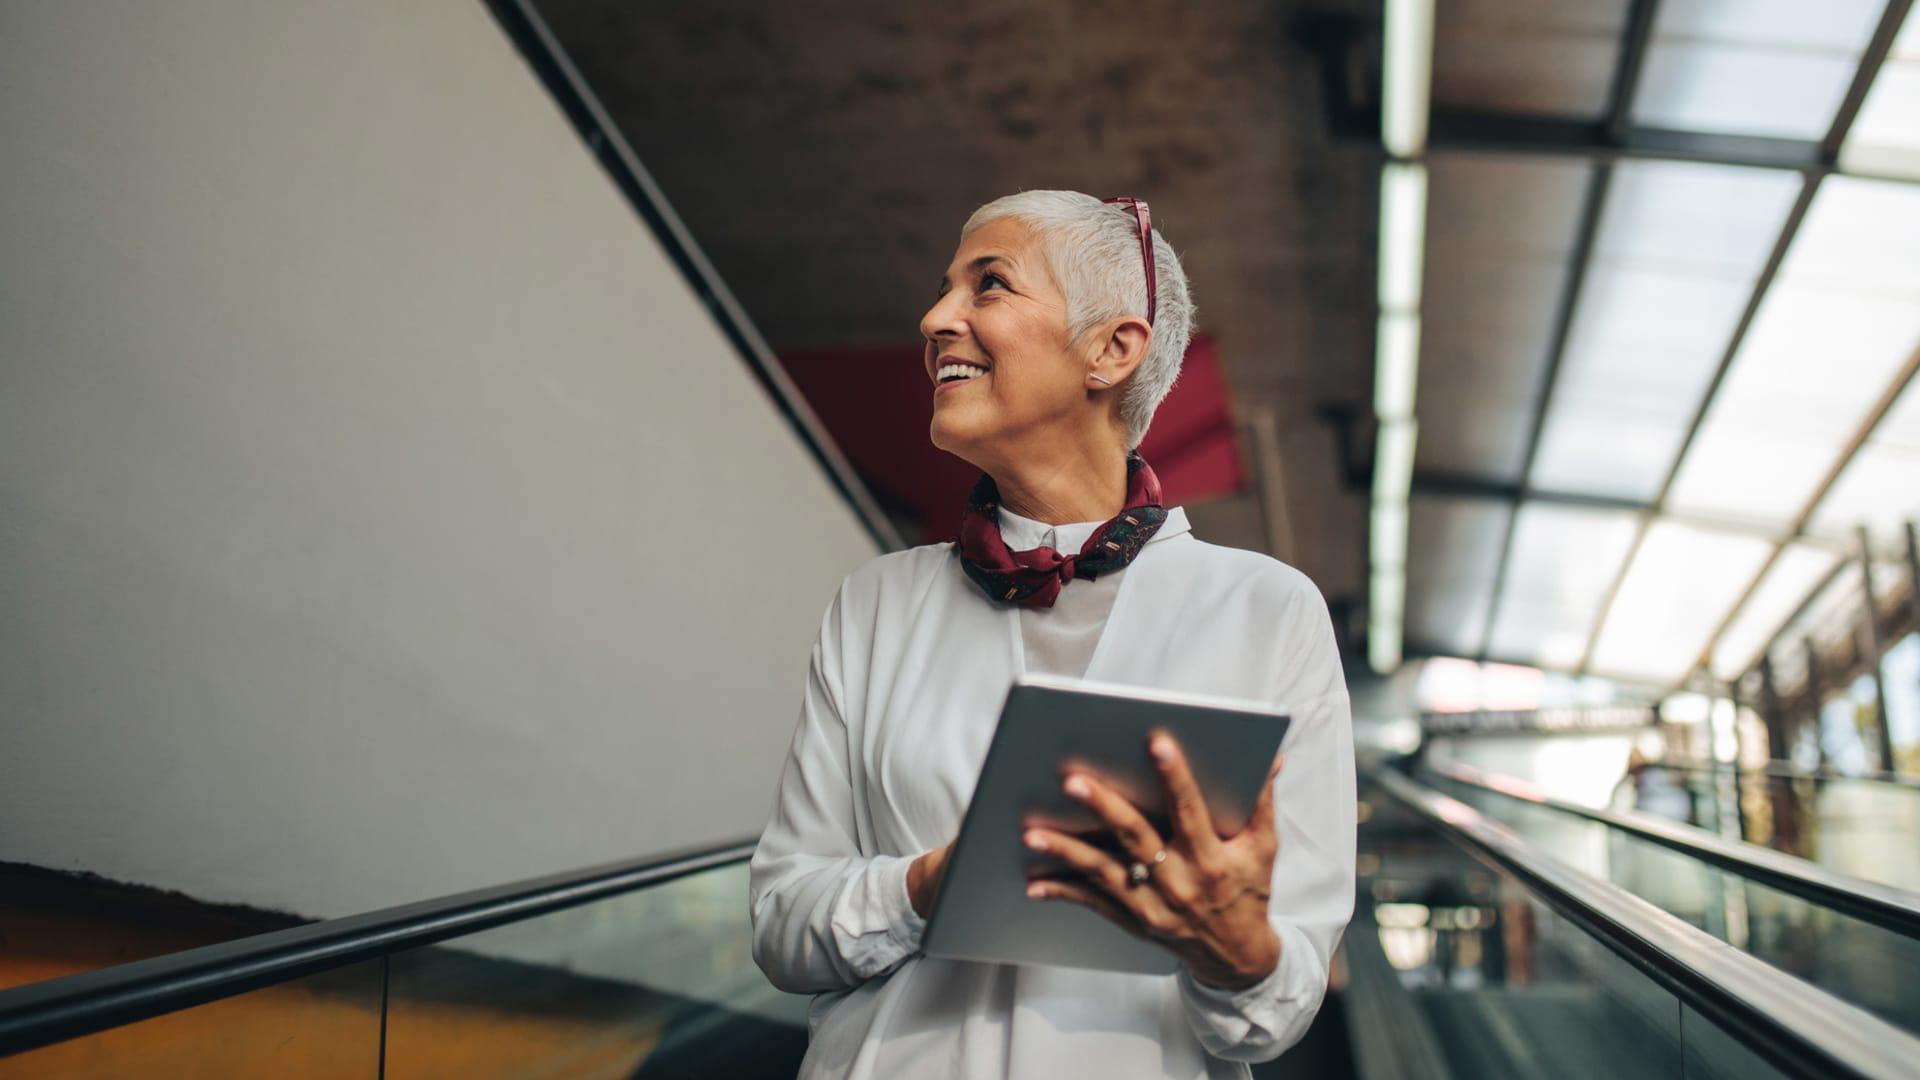 8 Ways to Improve Your Self-Confidence and Esteem as an Entrepreneur